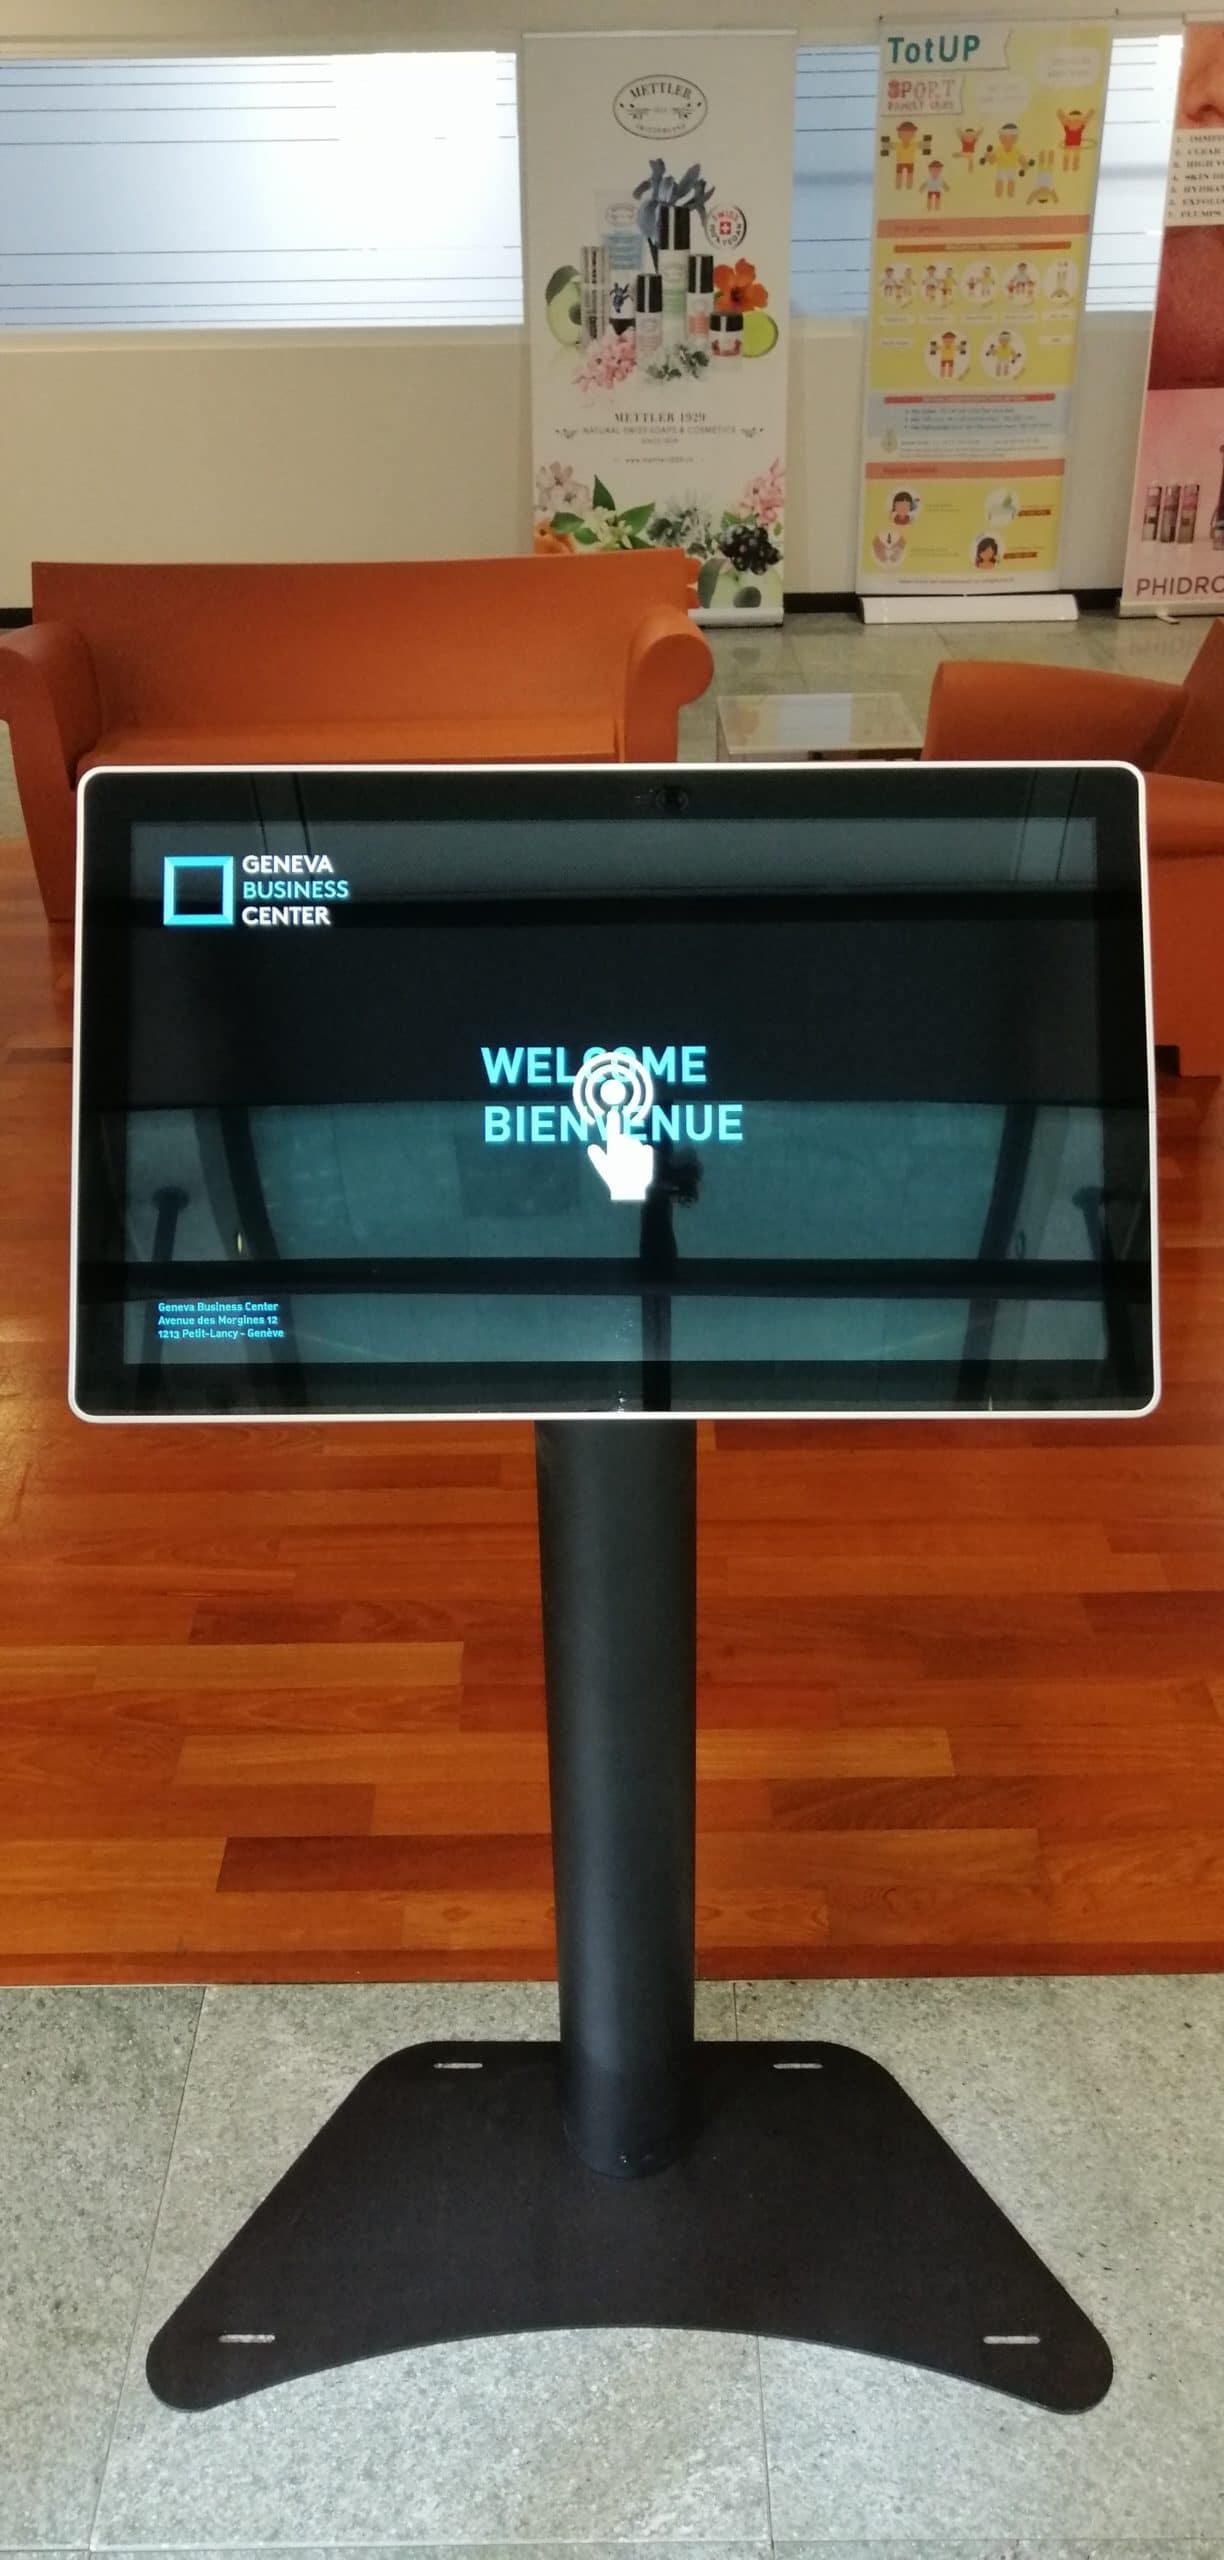 Geneva Business Center Borne 2 vue de face message bienvenu